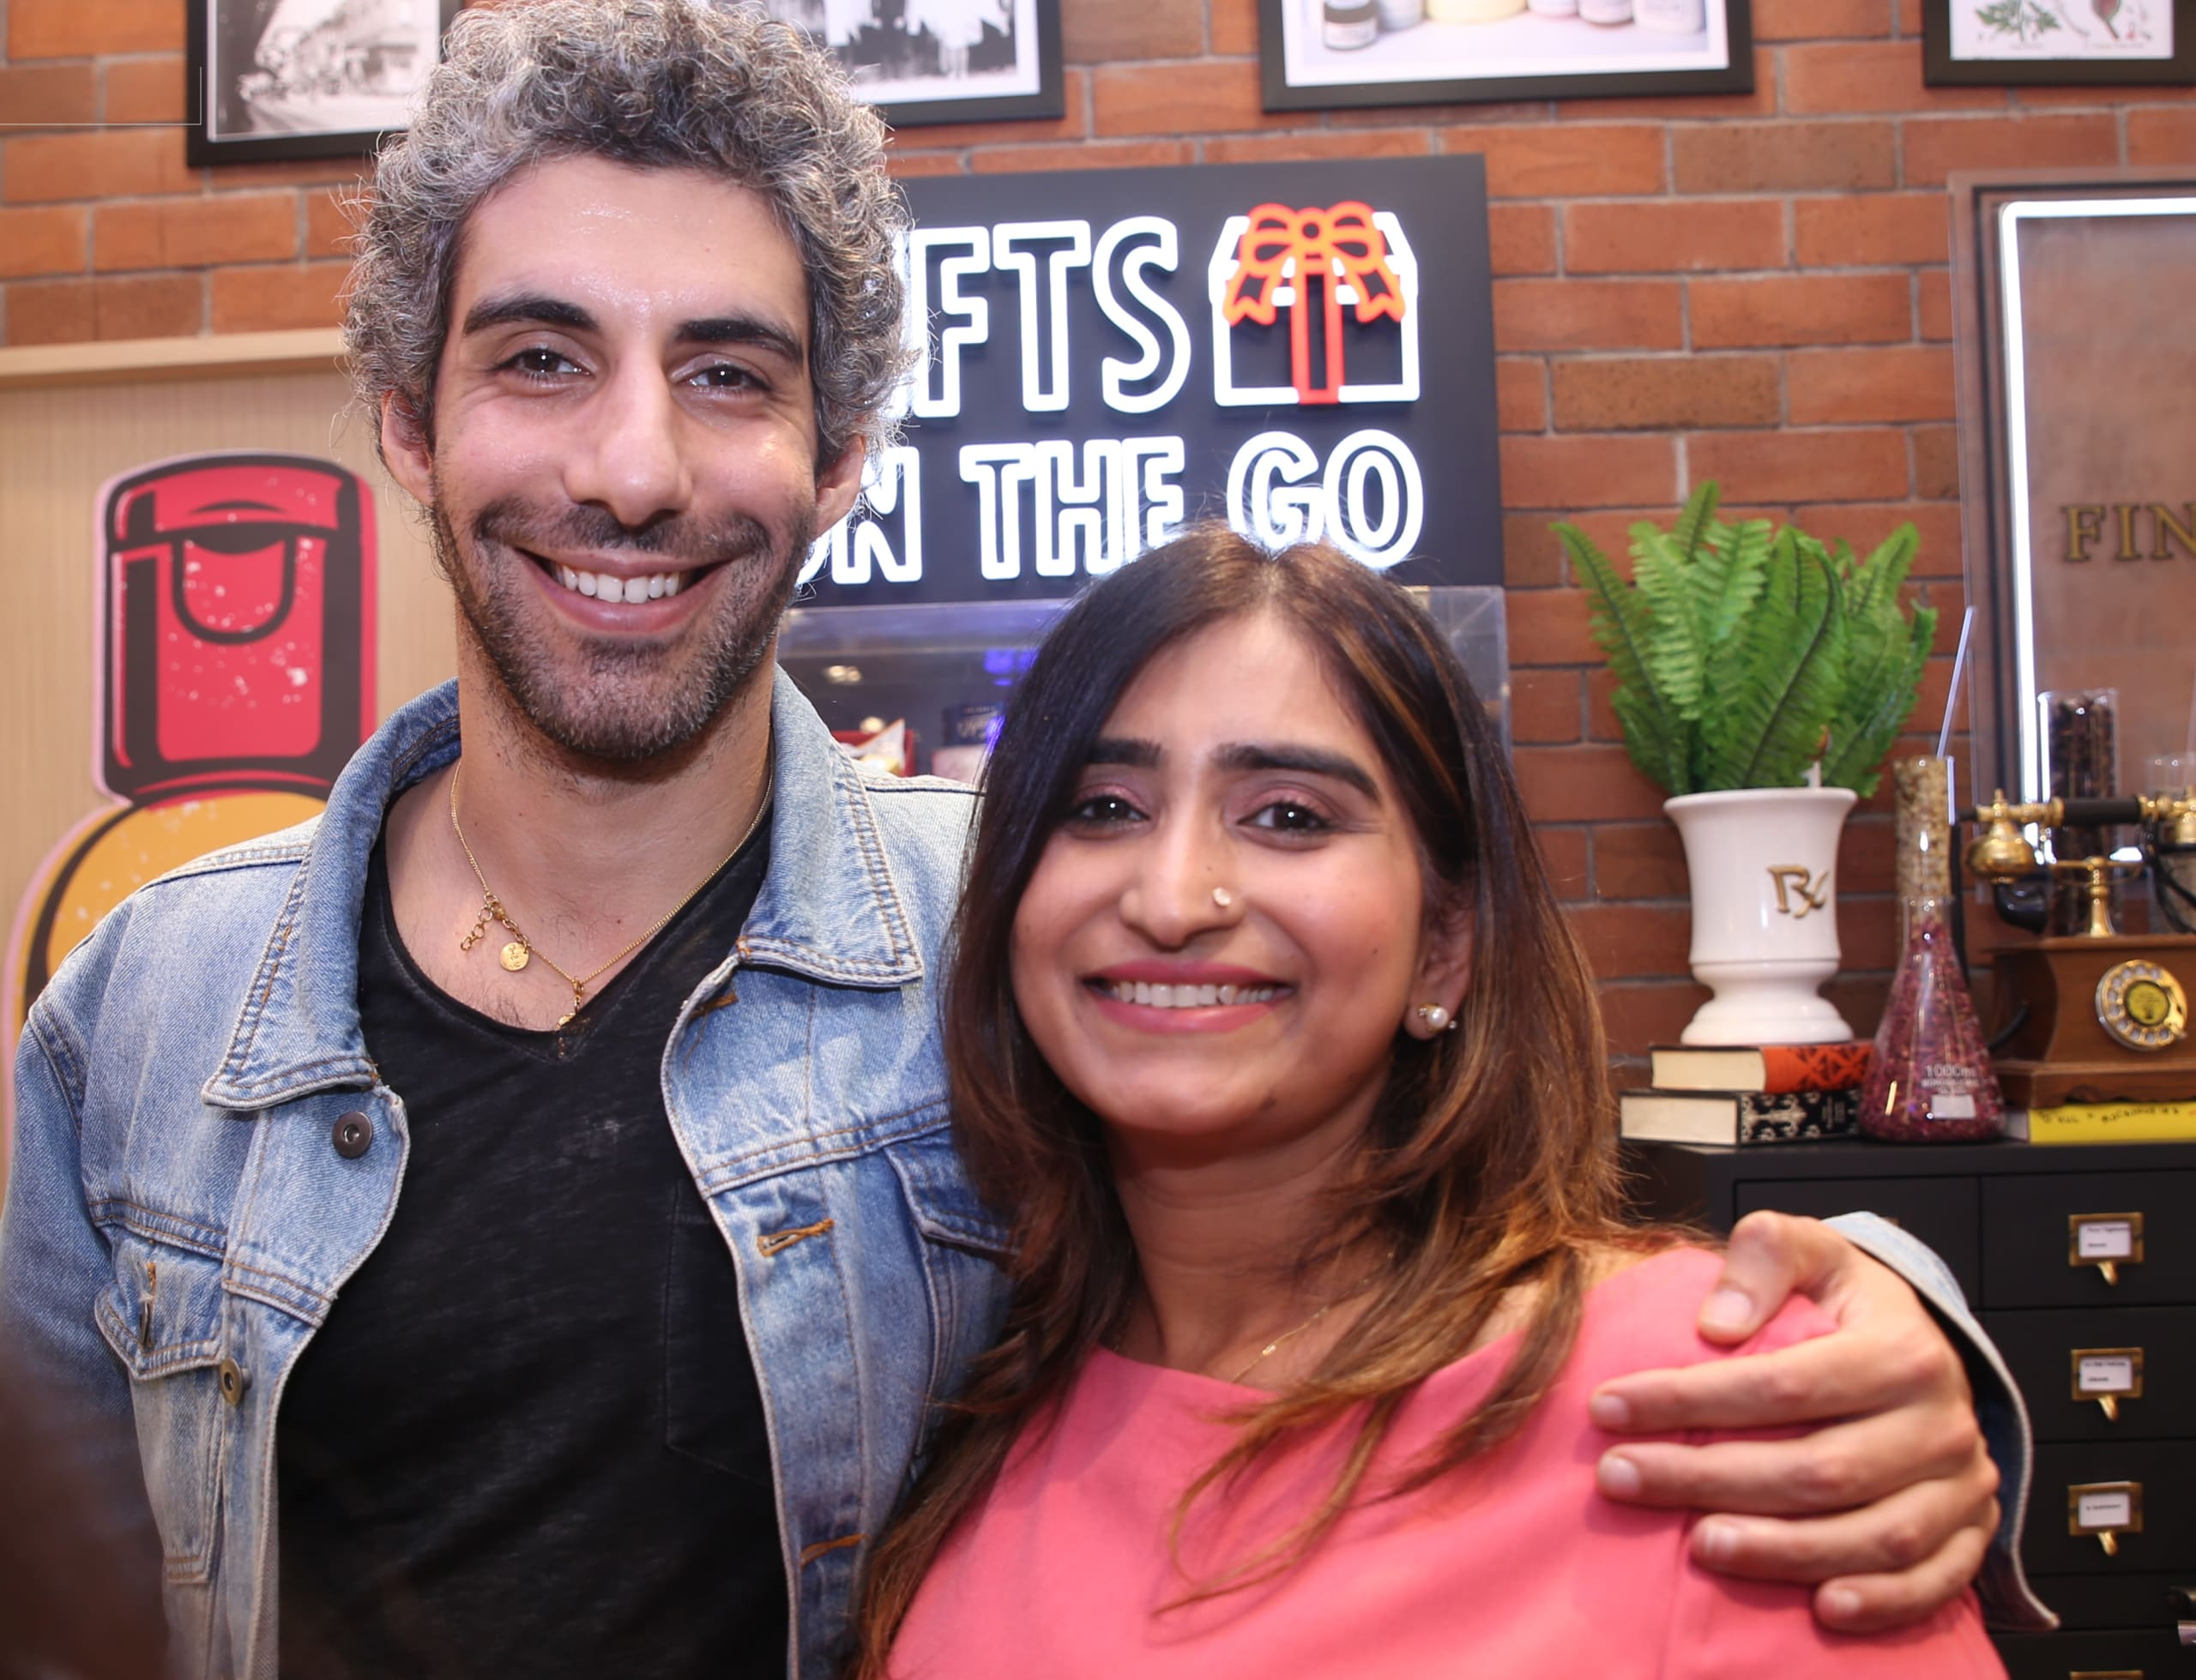 Jim Sarbh with Shikhee AGrawal @kiehl's India